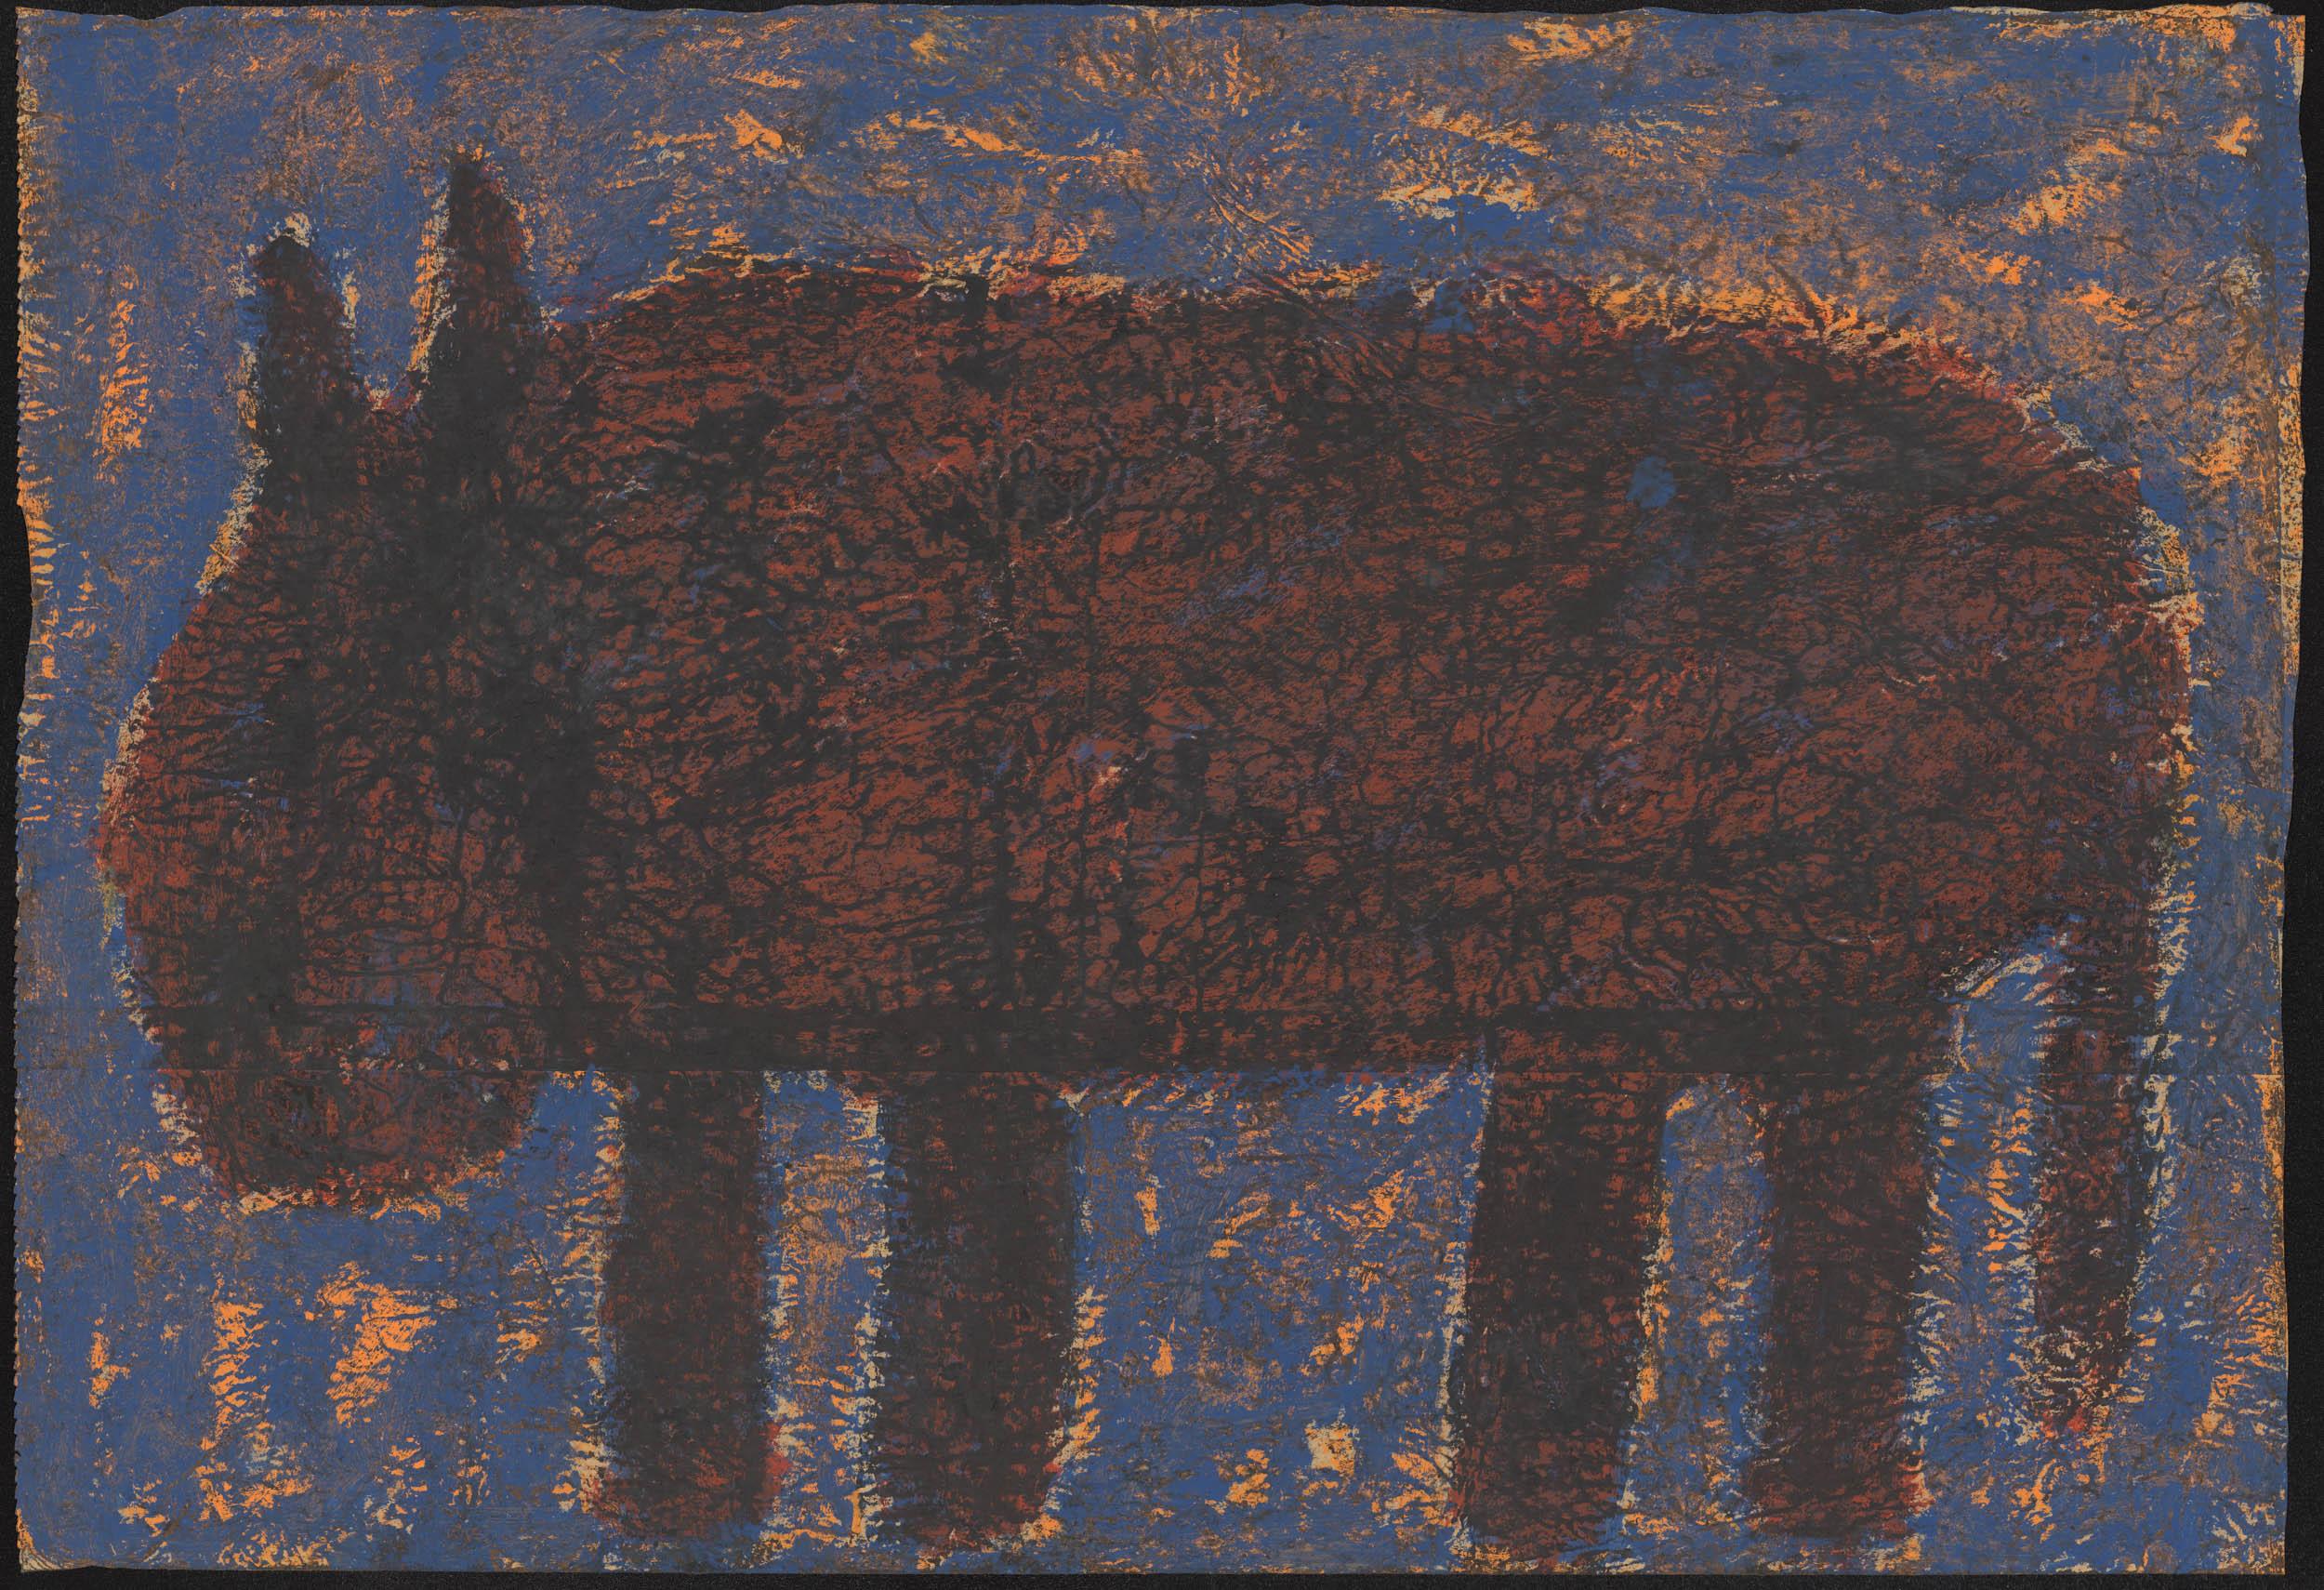 nedjar michel - untitled | Paris Belleville 1988